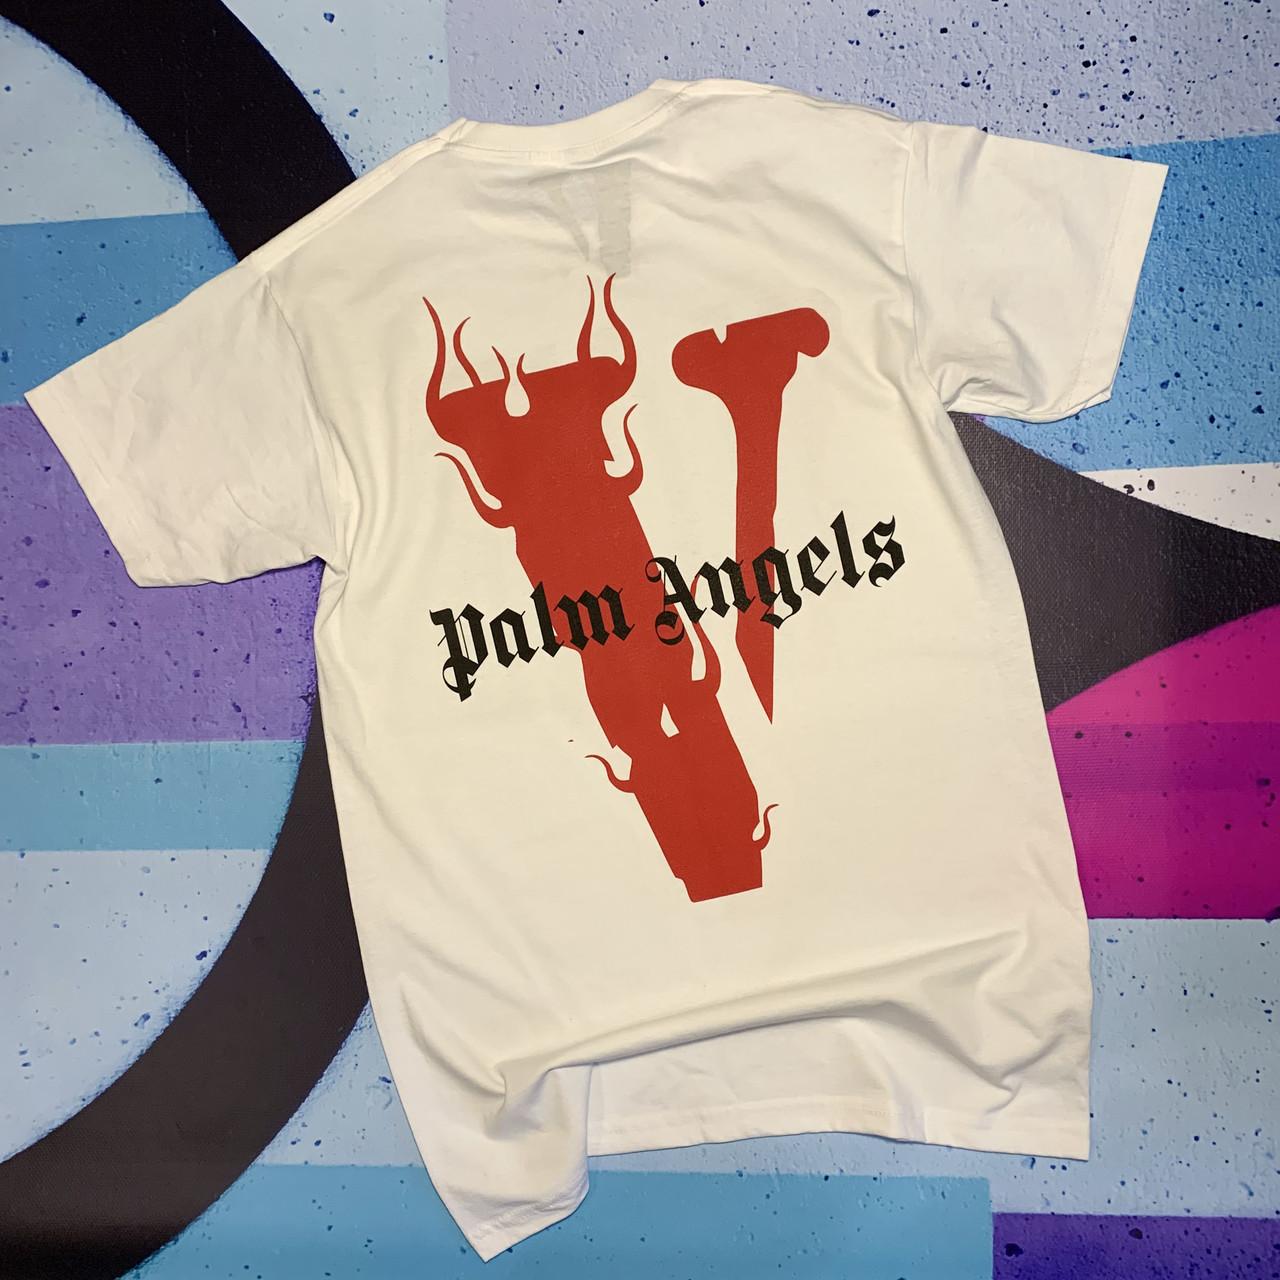 Футболка белая Palm Angels x Vlone Red • Палм Анджелс футболка